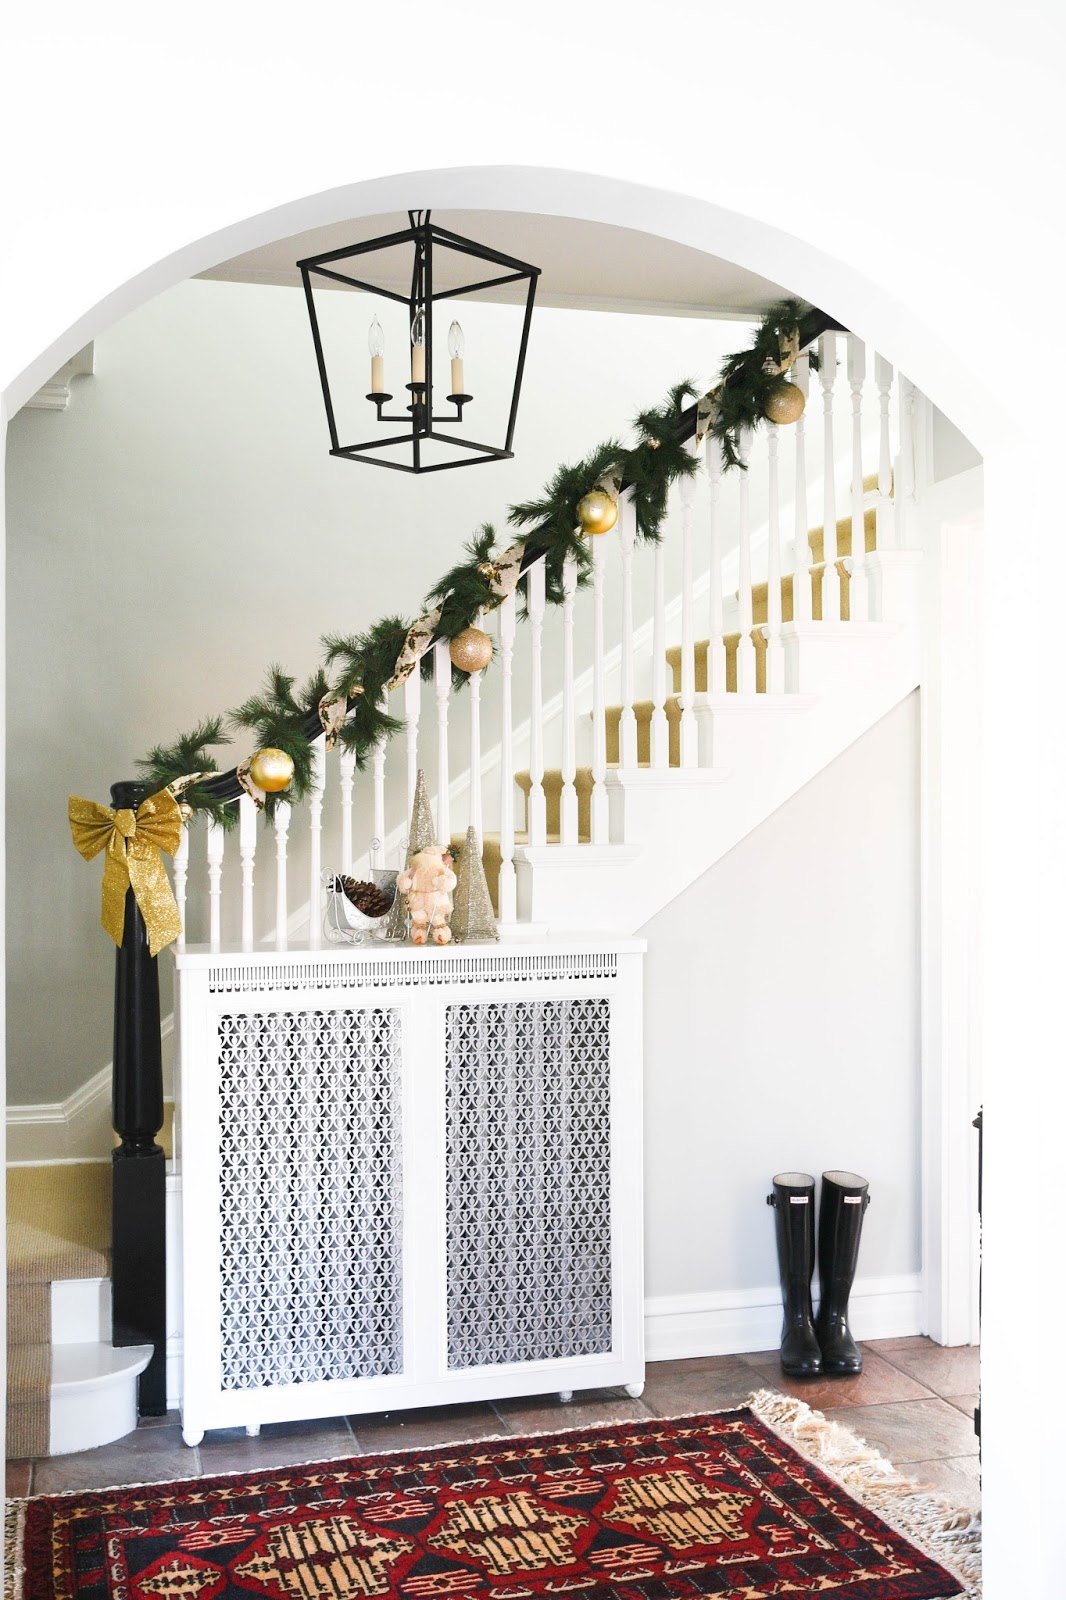 Christmas Holiday Banister Decorations www.homewithkeki.com #interiors #christmasdecorations